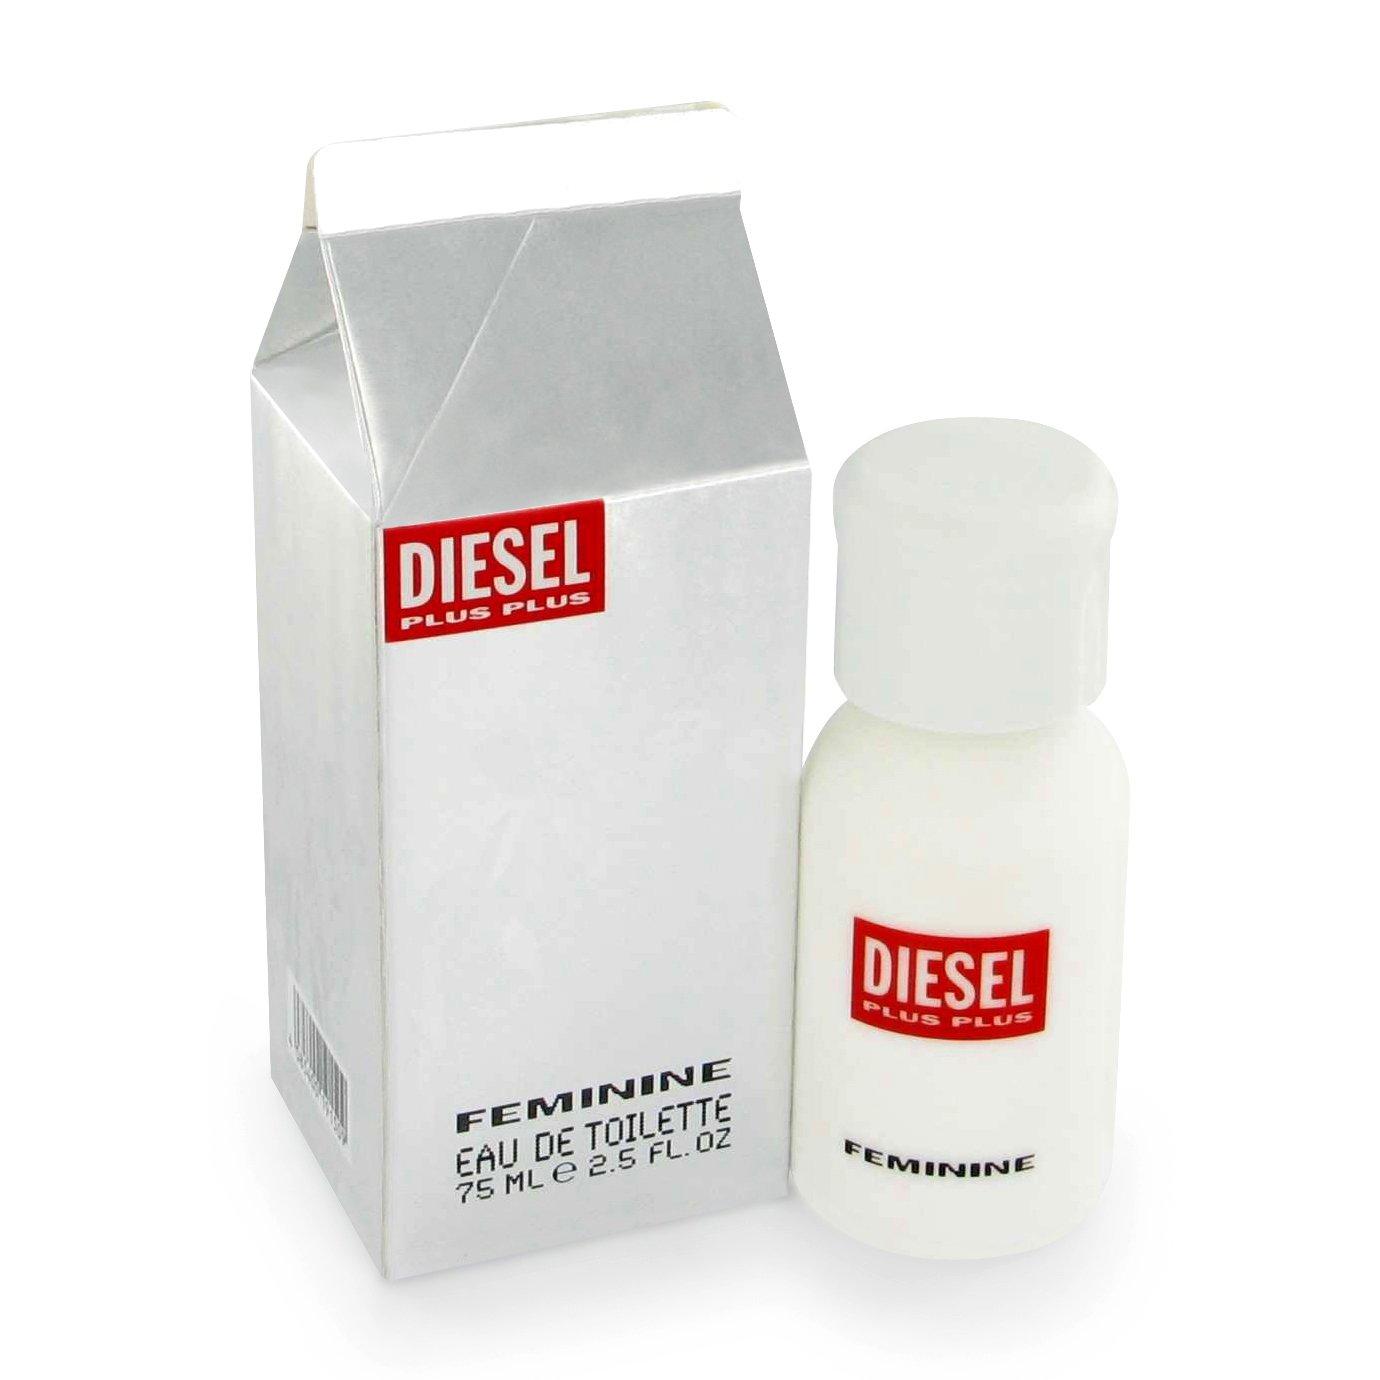 Diesel Plus Plus Eau De Toilette Spray 2.5 Oz for Men by Diesel S0556639